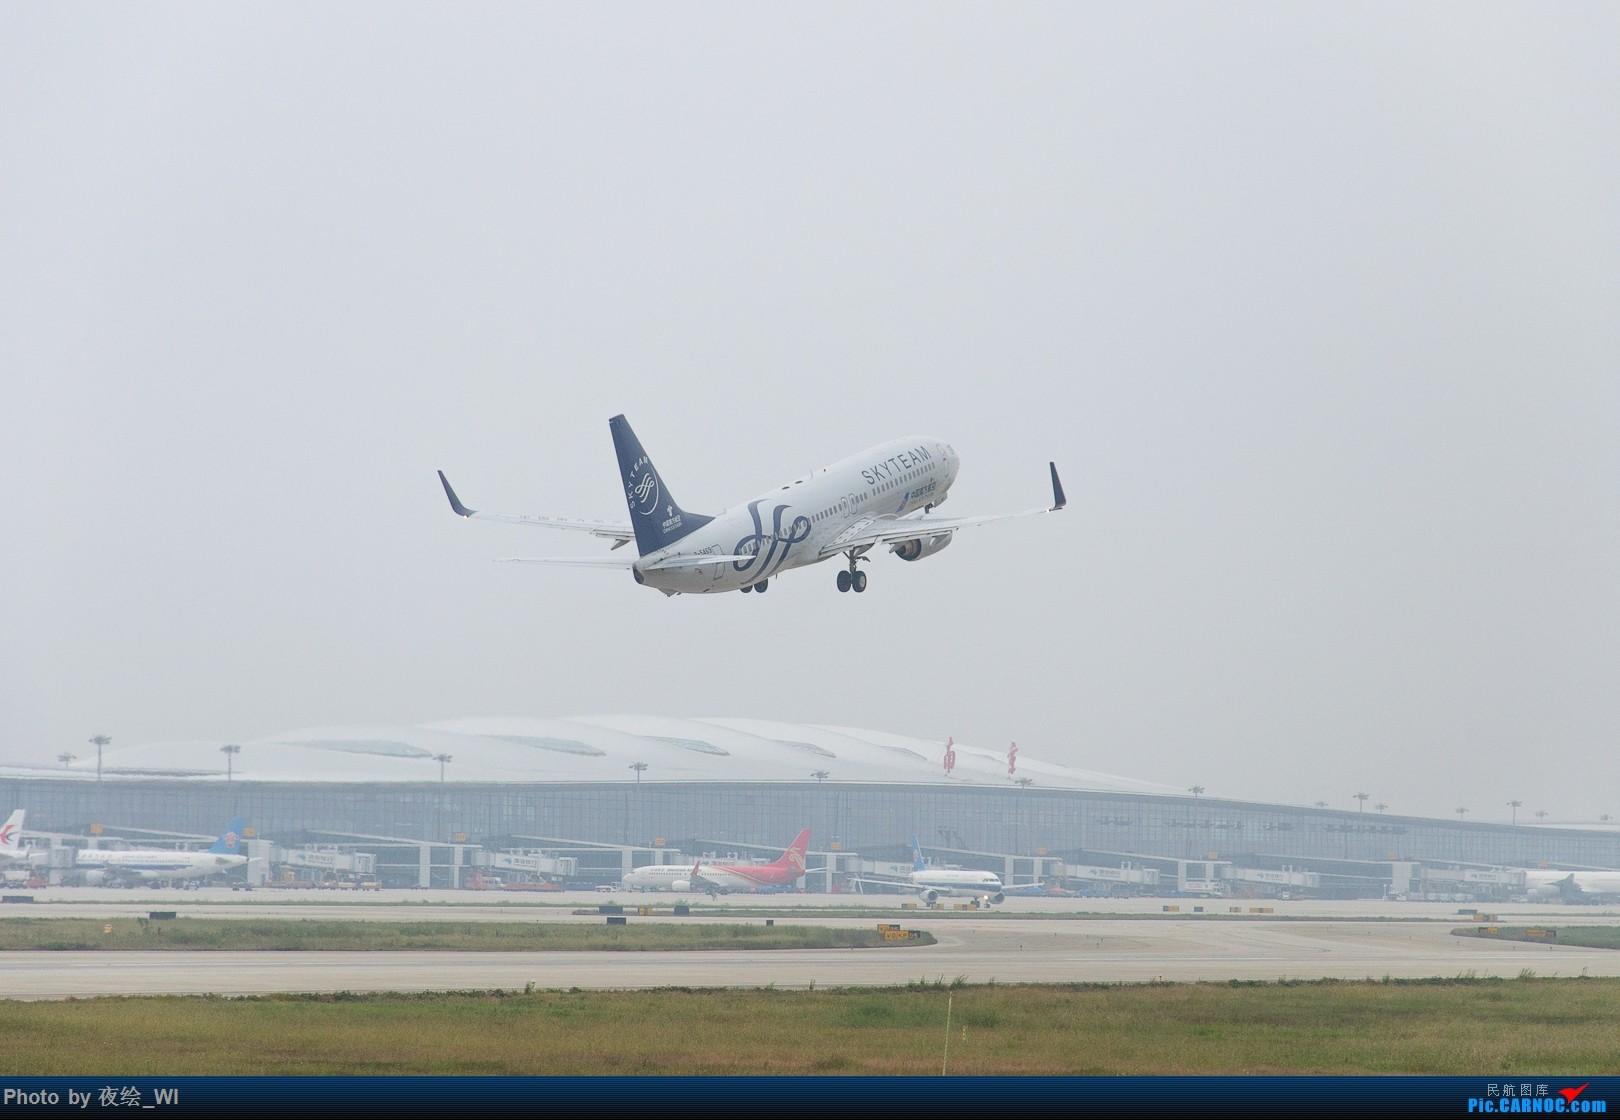 Re:[原创]【NKG】生日也要拍飞机,珍惜南京久违的单跑运行时光 BOEING 737-800 B-5469 中国南京禄口国际机场